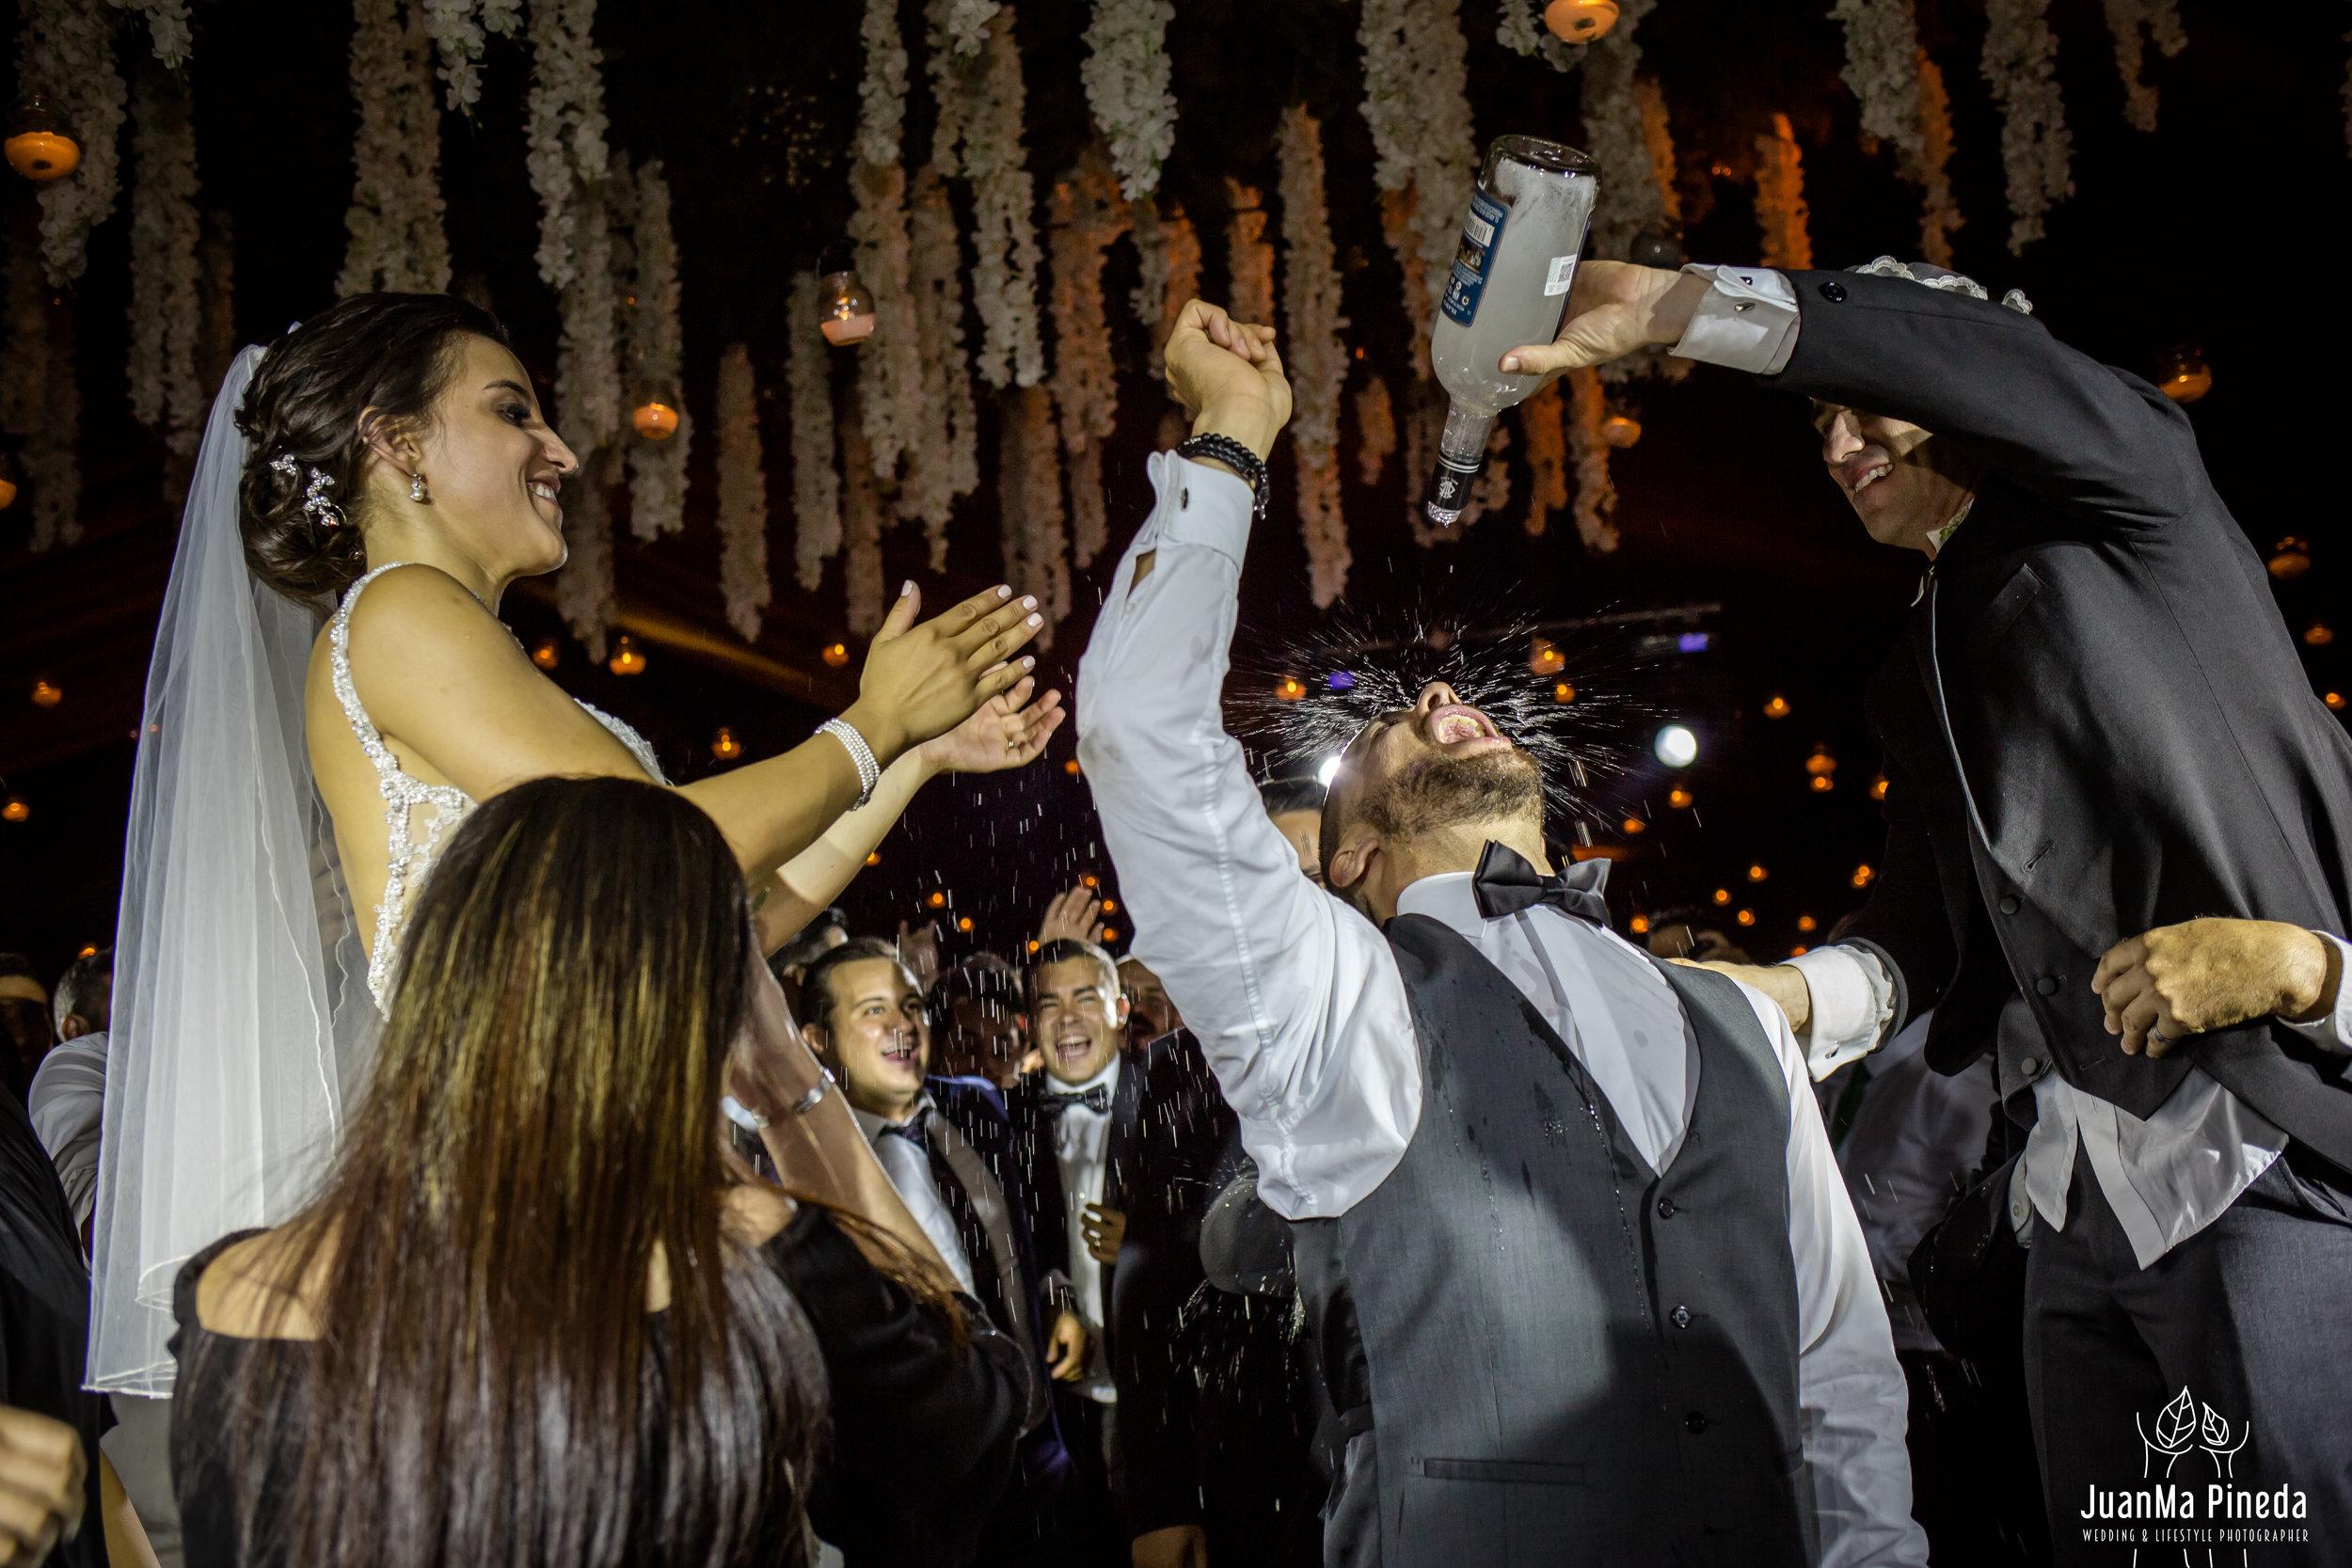 Wedding+Day+Photographer-1-17.jpg